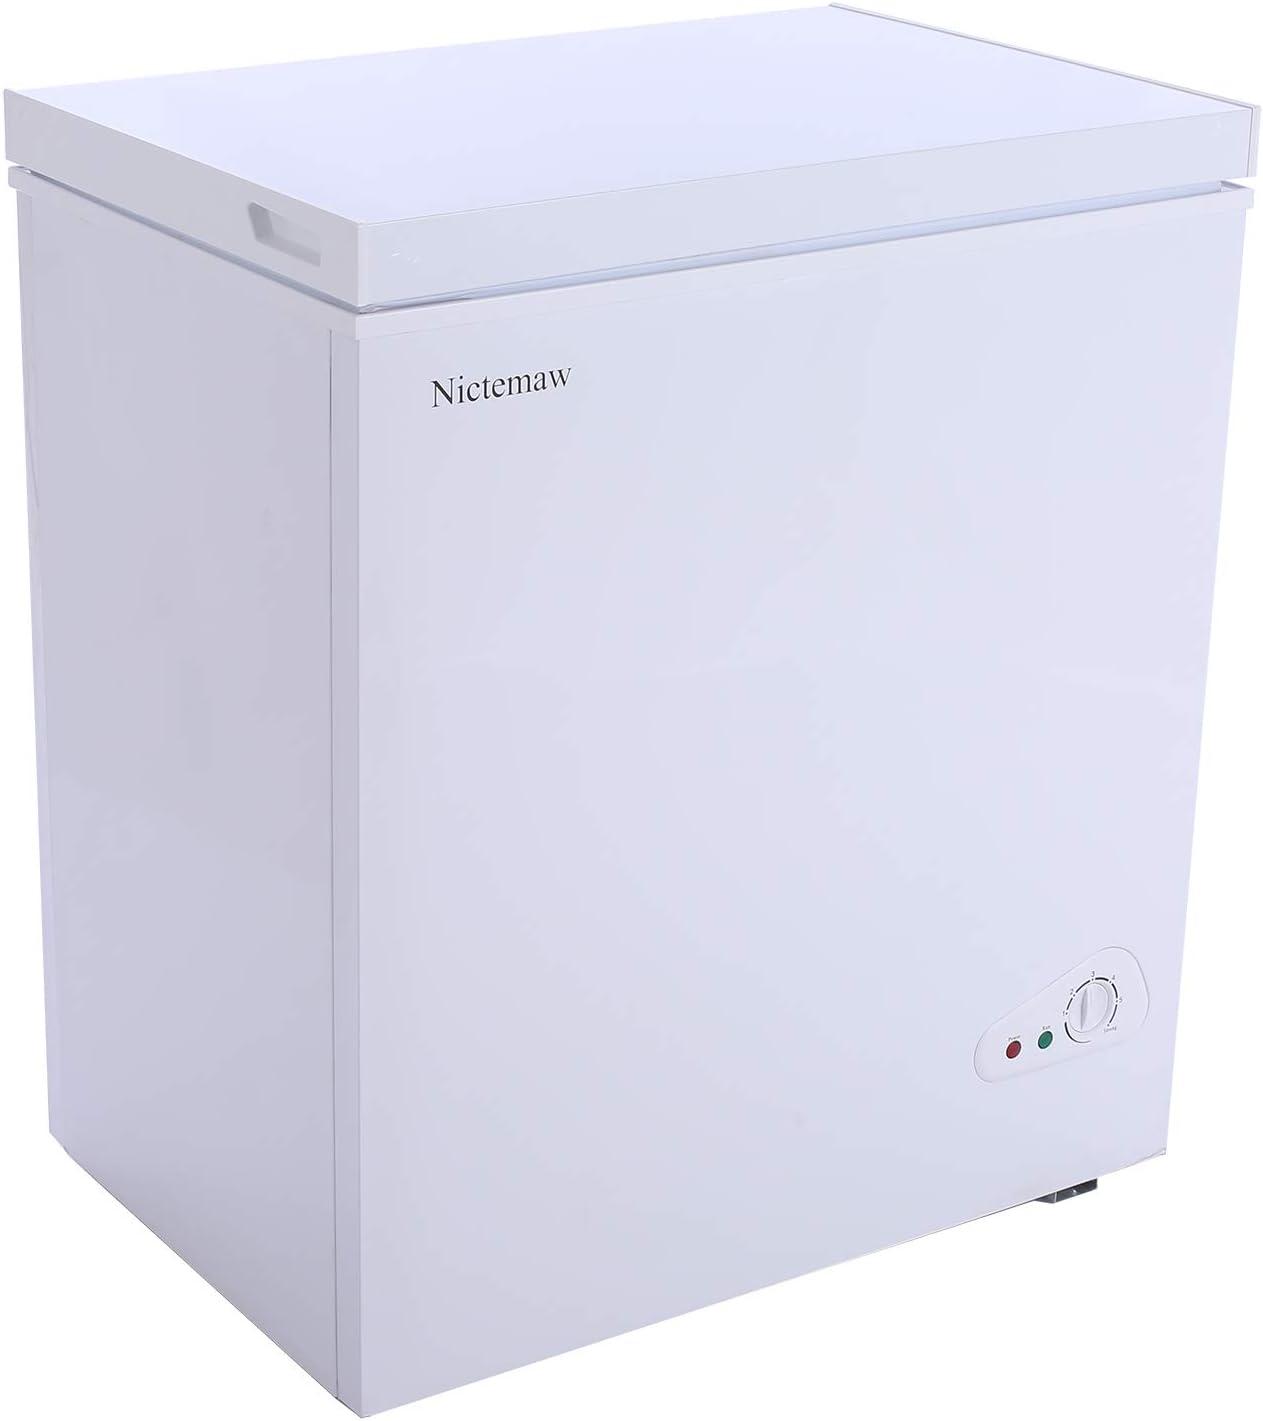 Nictemaw Chest Freezer Luxury goods 5.3 Inexpensive Large Capacity Cu.Ft